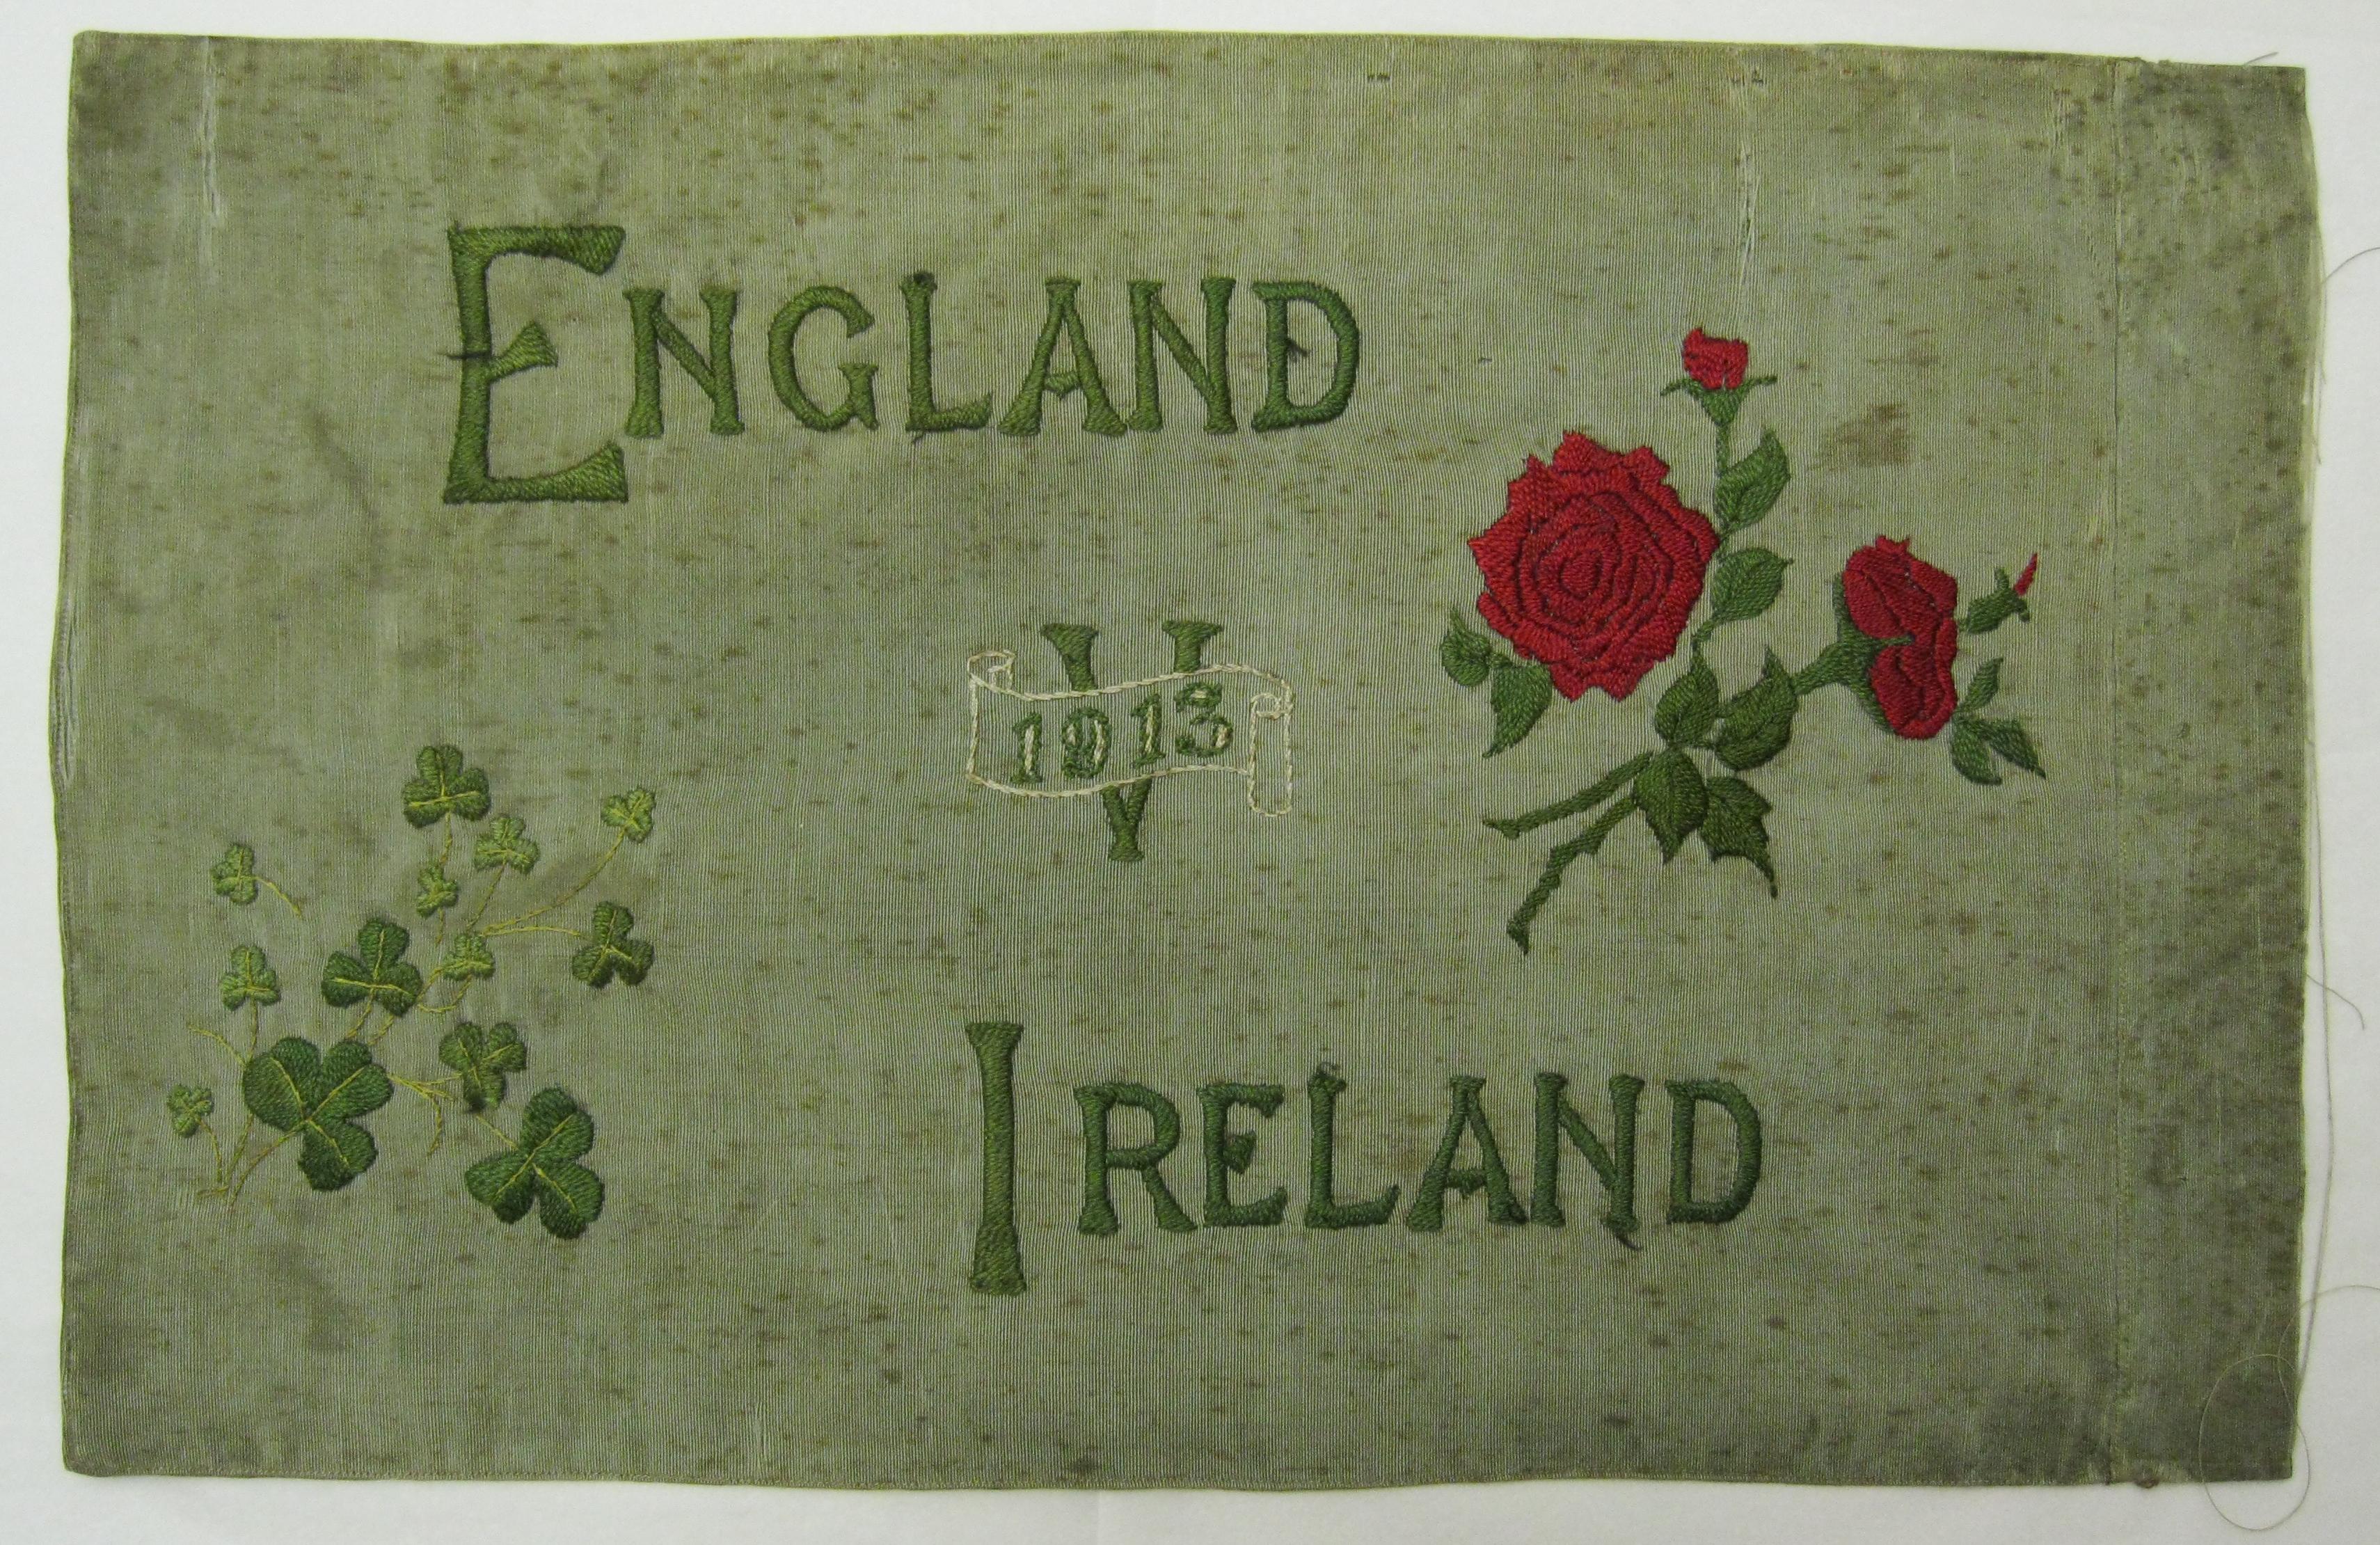 Tough Flag 1913 2010-1851